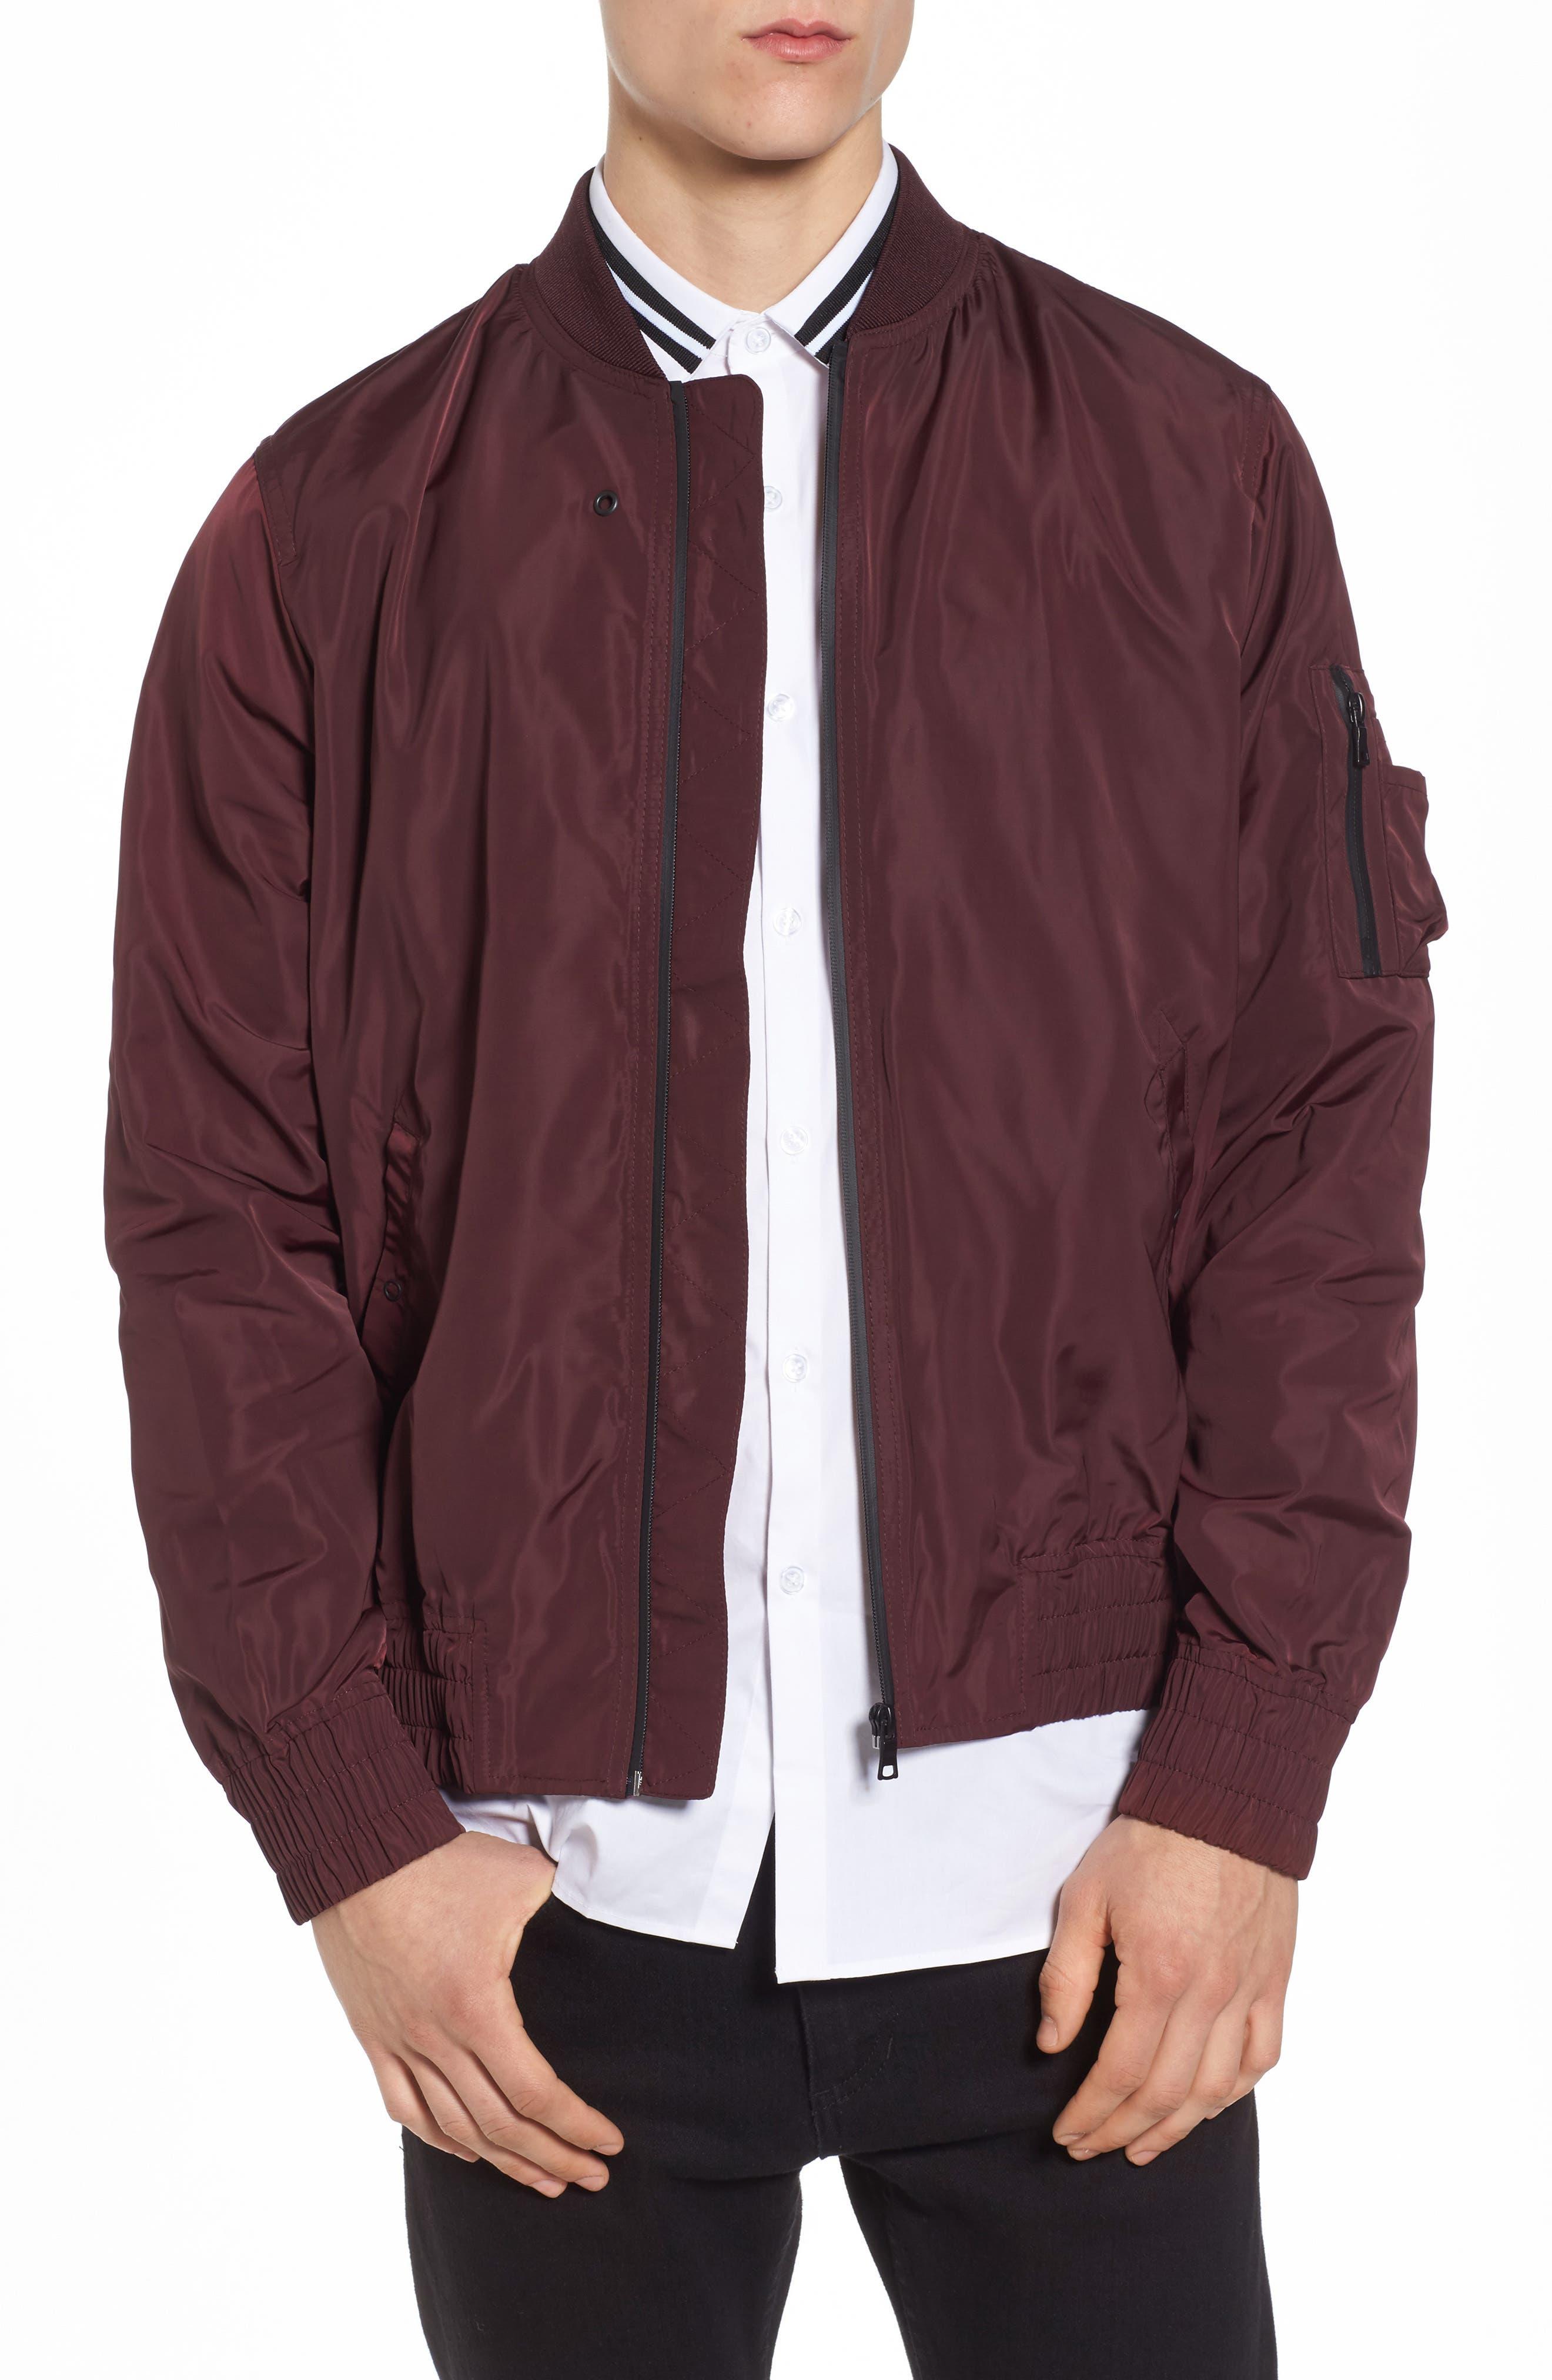 Elton Bomber Jacket,                         Main,                         color, 930